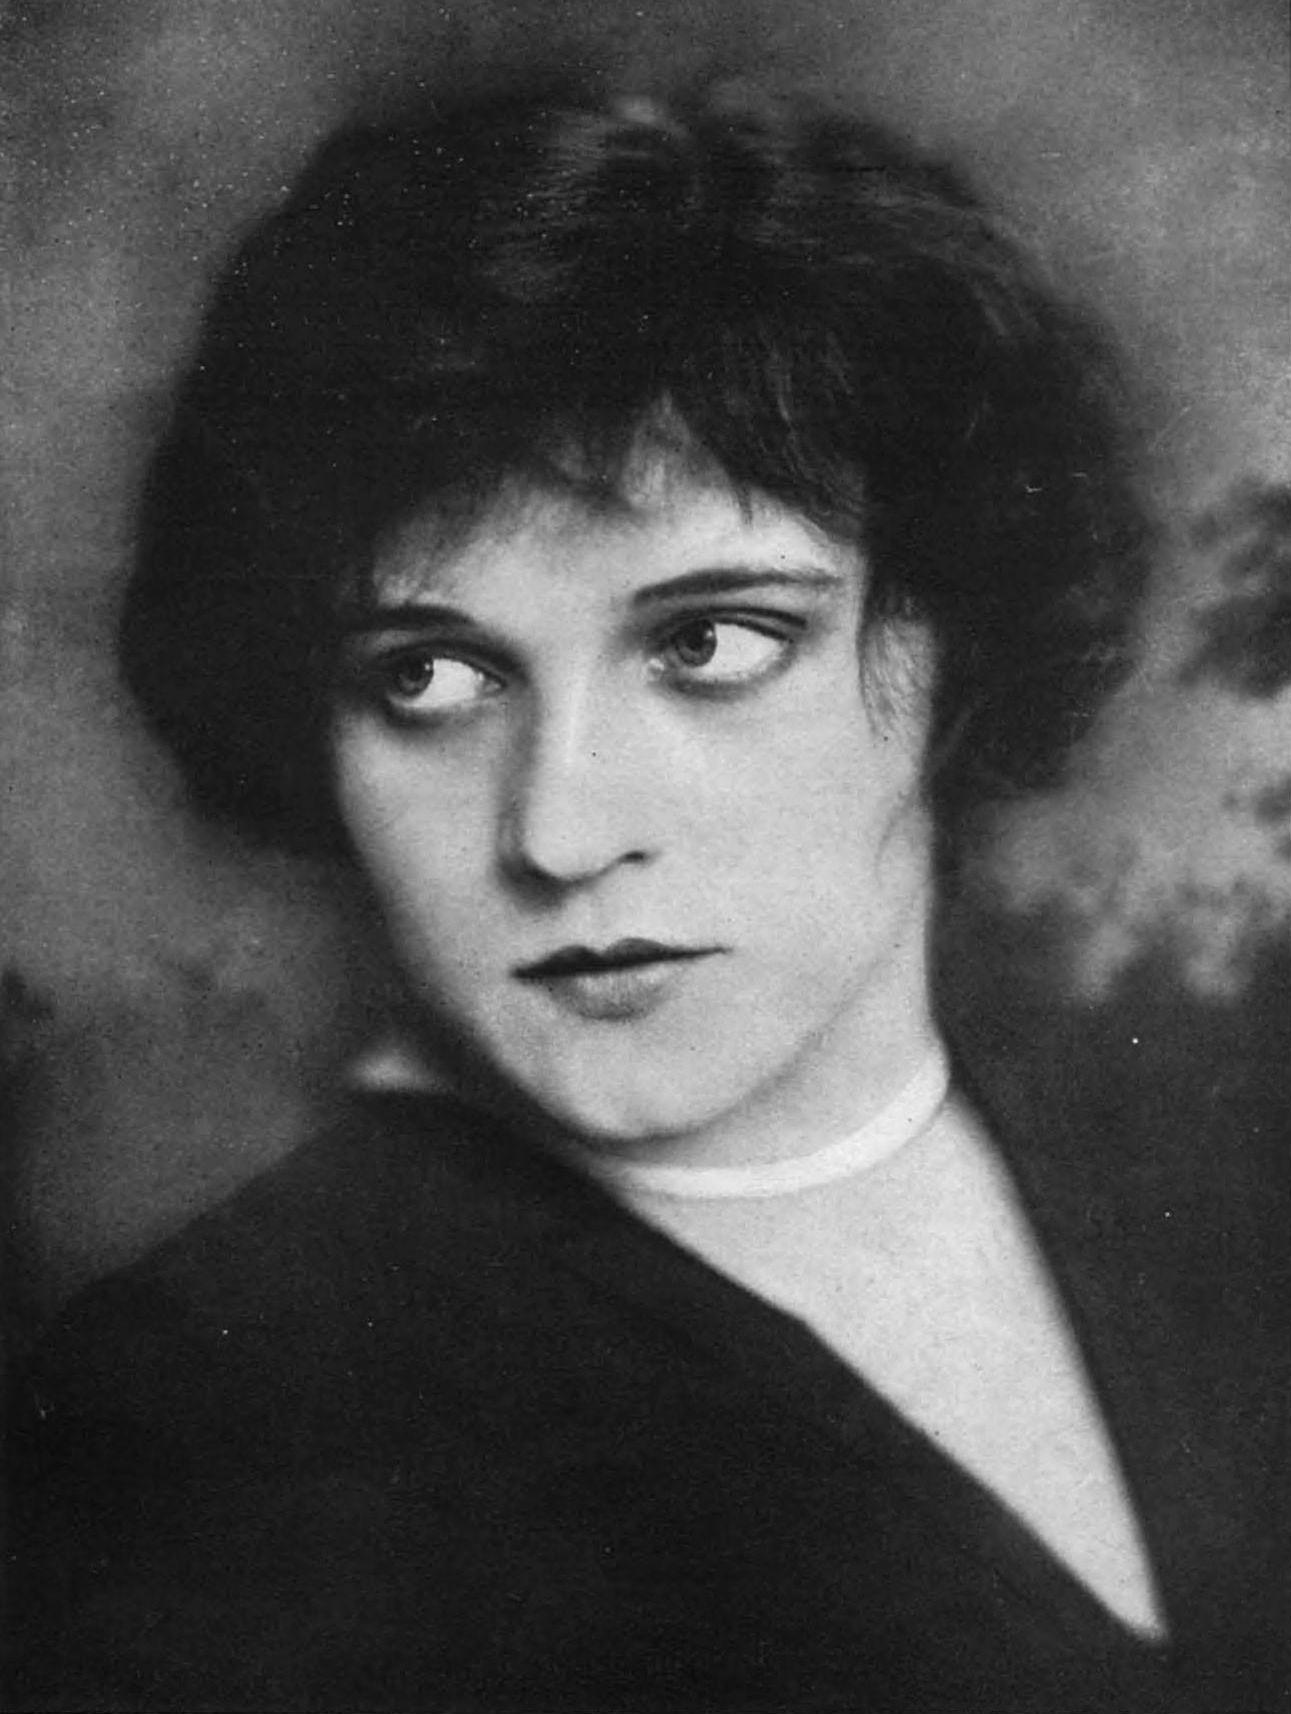 Betty Schade